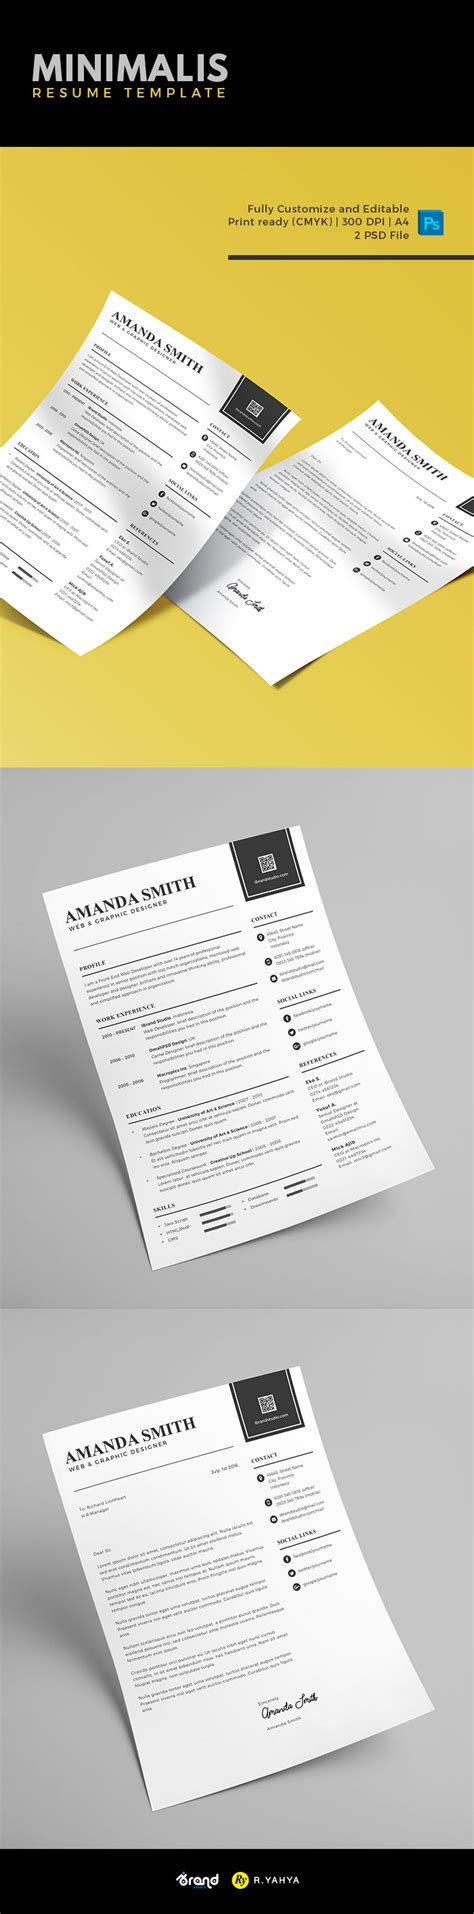 template minimalis free minimalis resume template cover letter